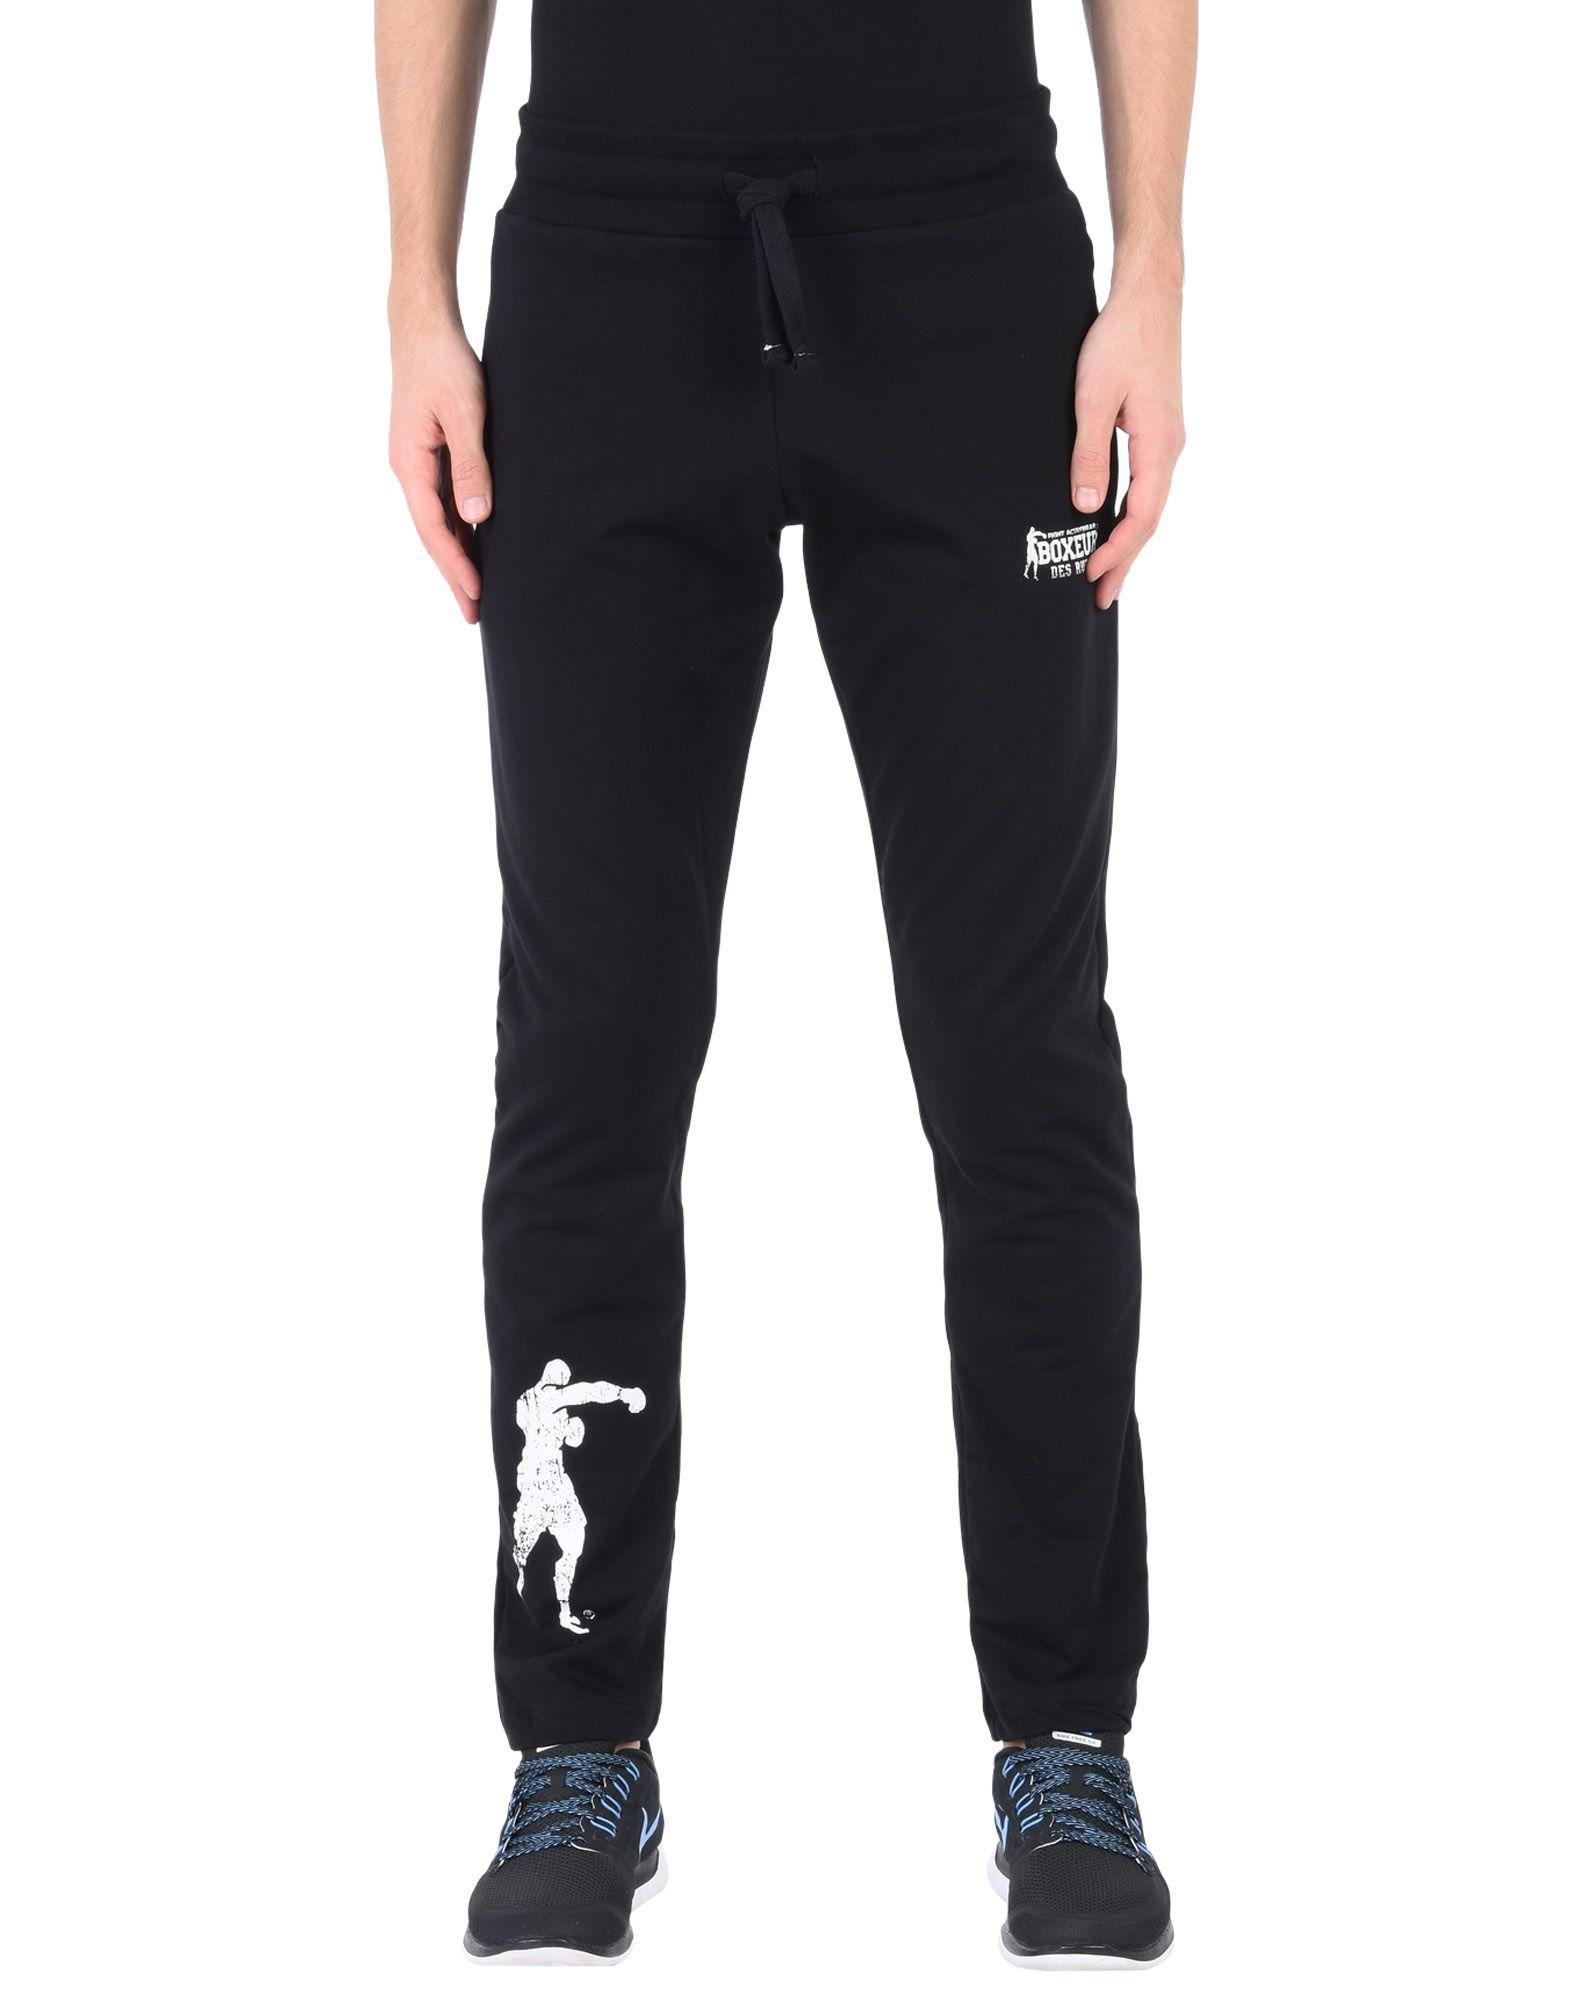 Pantalone Boxeur Des Rues Training Sweat Pants Uomo - Uomo Pants - 36949193HX 7a0fcd